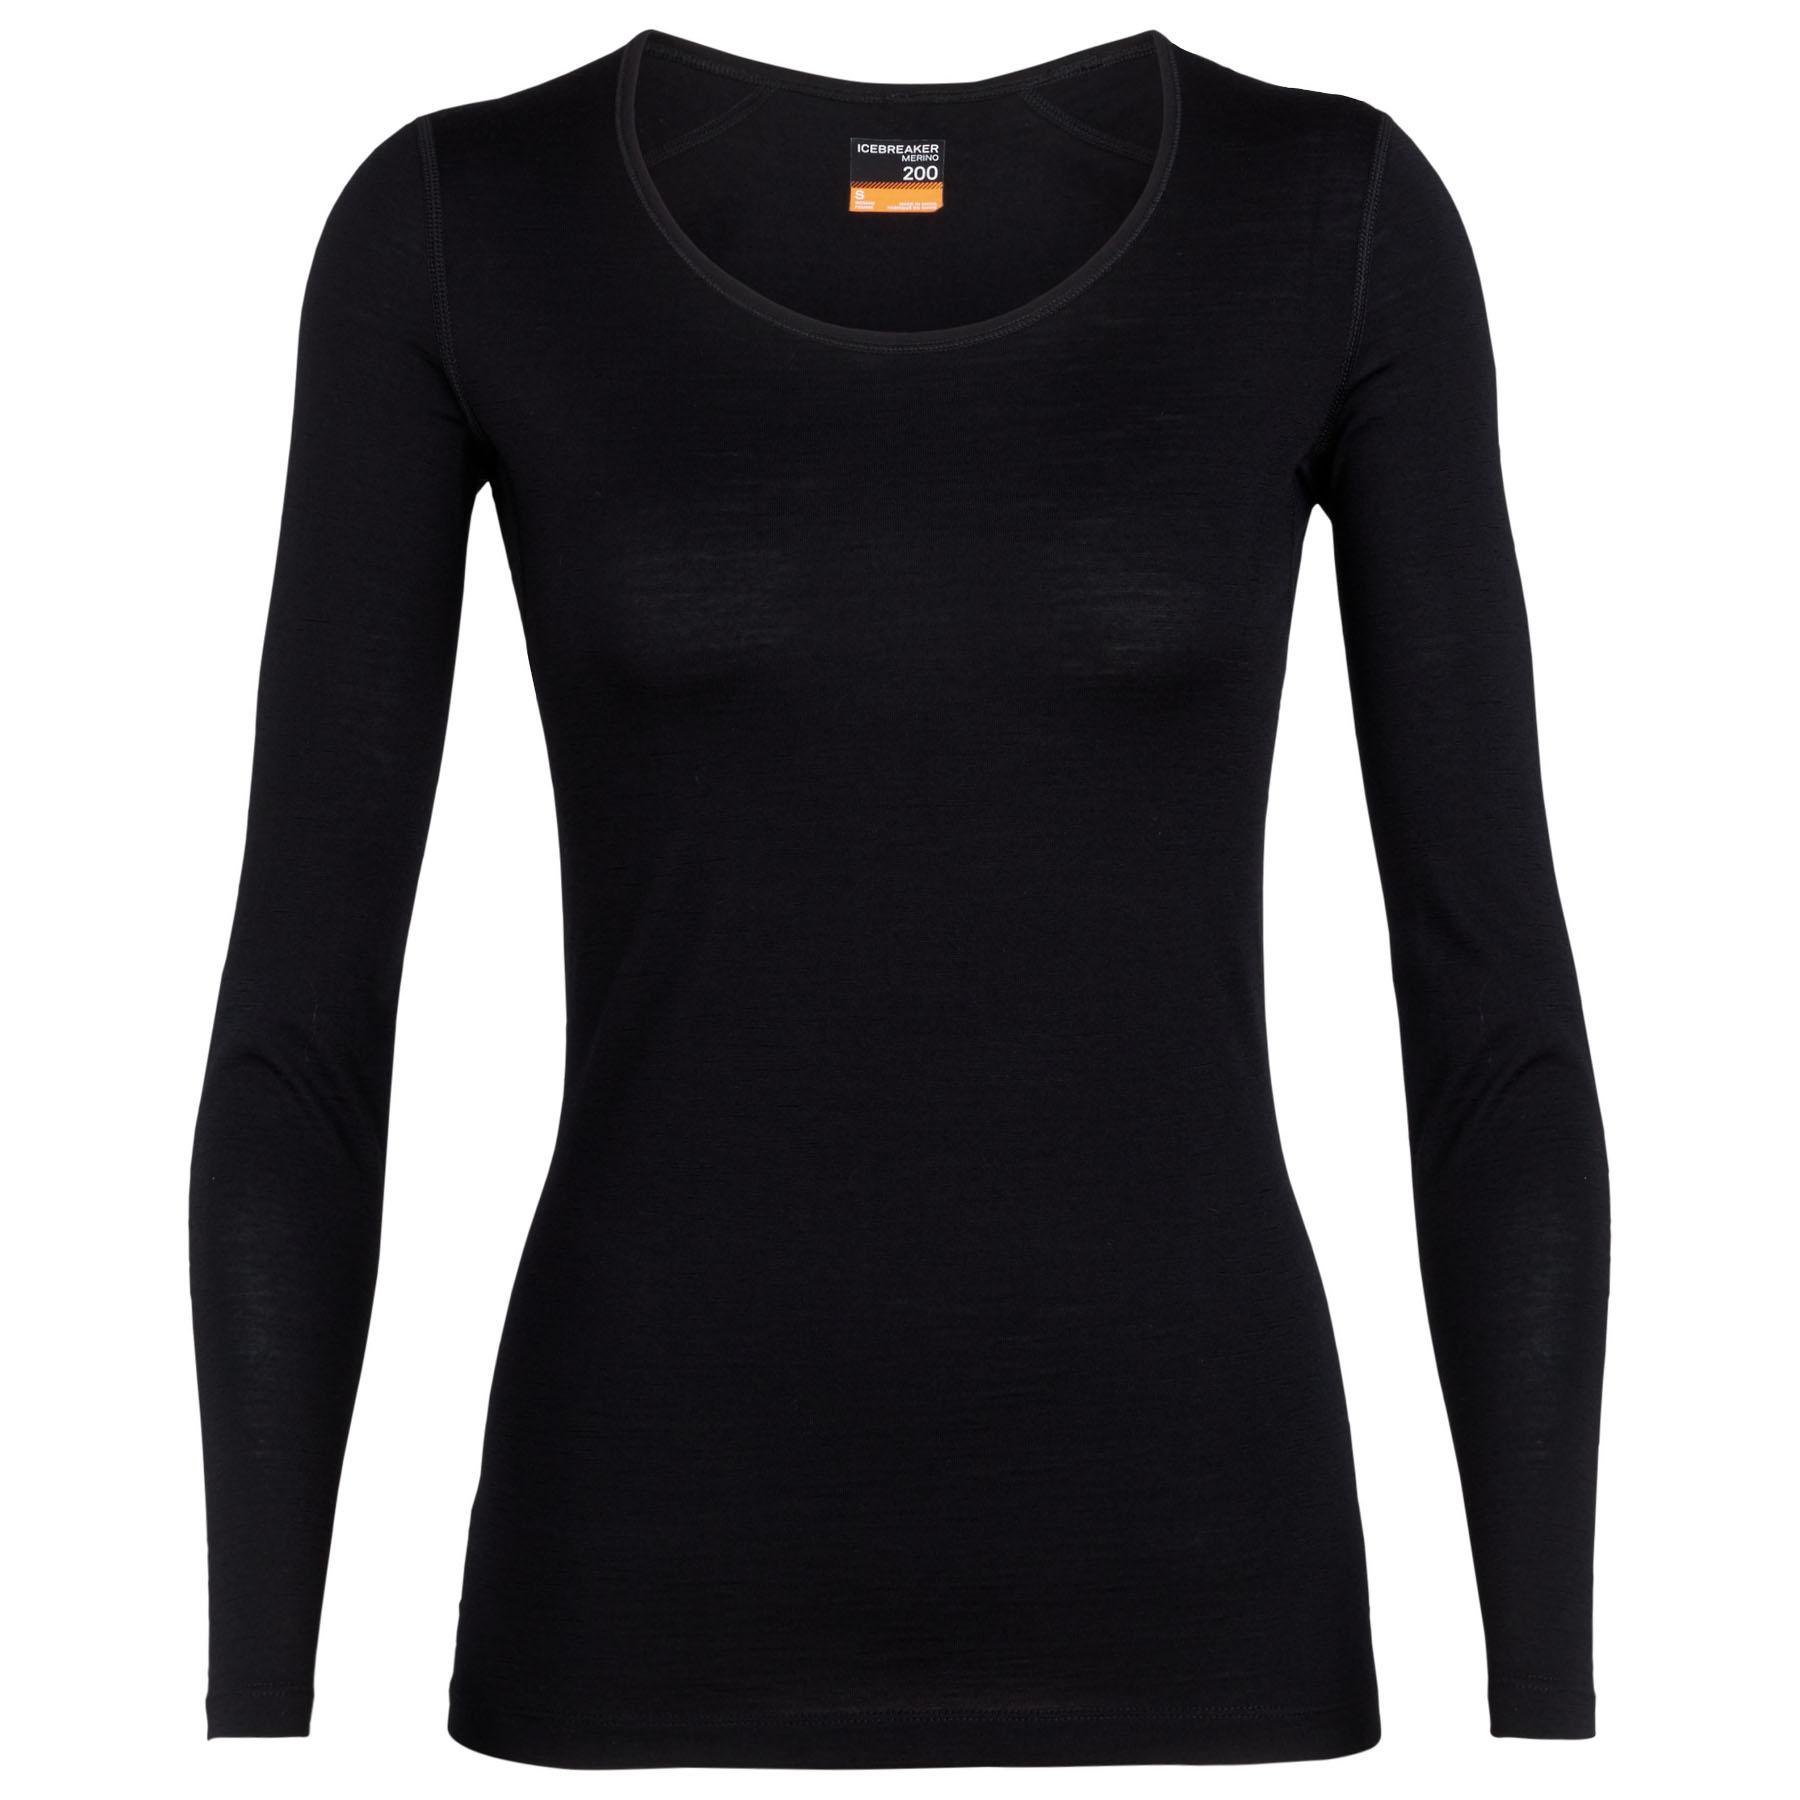 Produktbild von Icebreaker 200 Oasis Scoop Damen Langarmshirt - Black